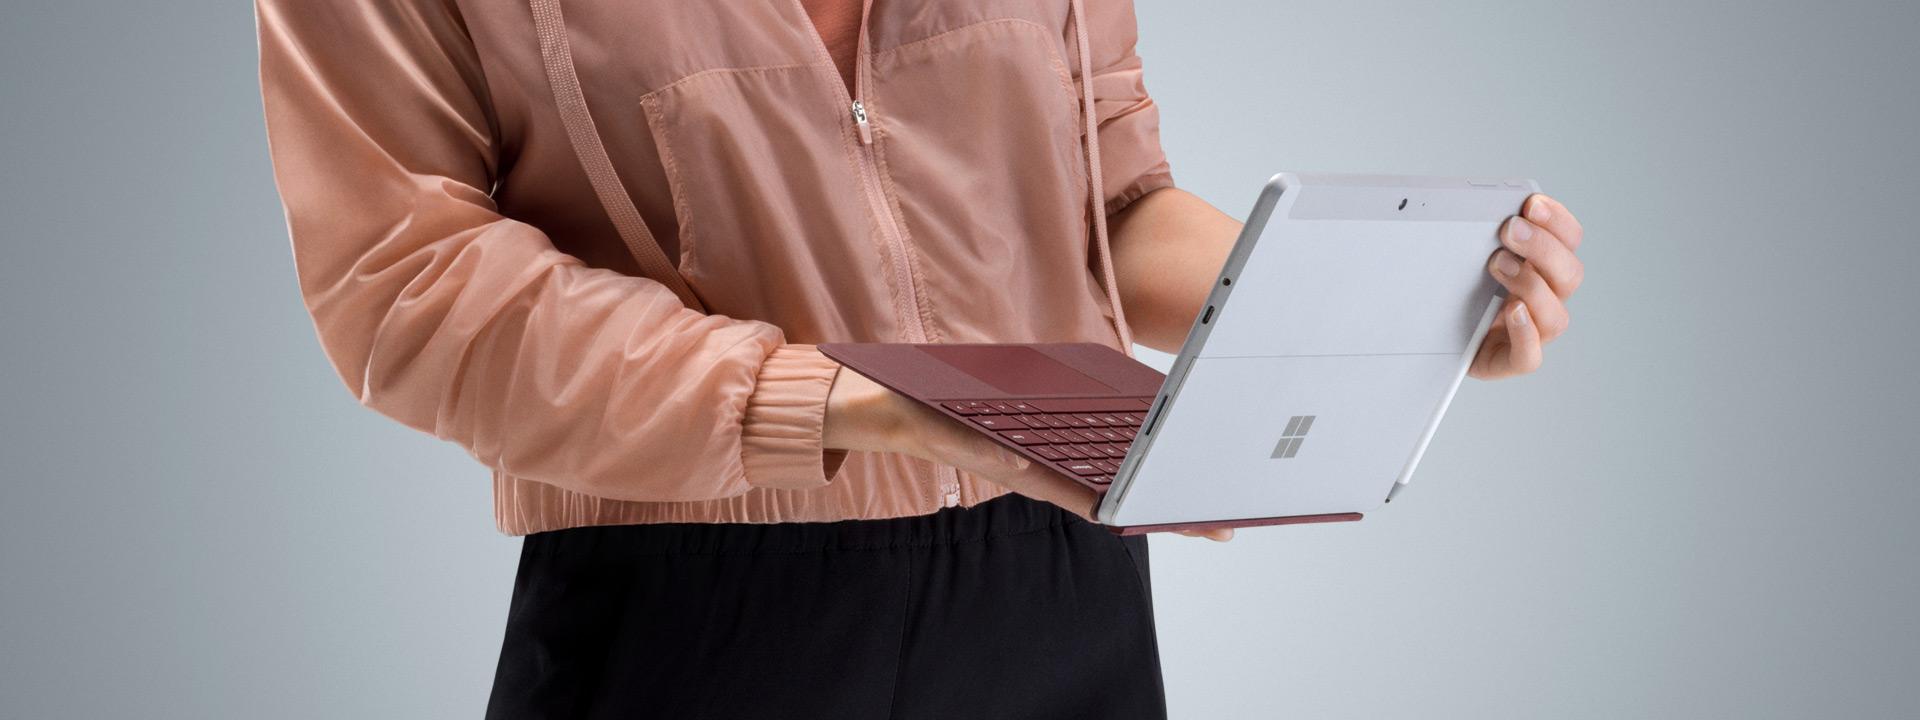 Surface Go를 들고 있는 핑크 자켓을 입은 여자아이